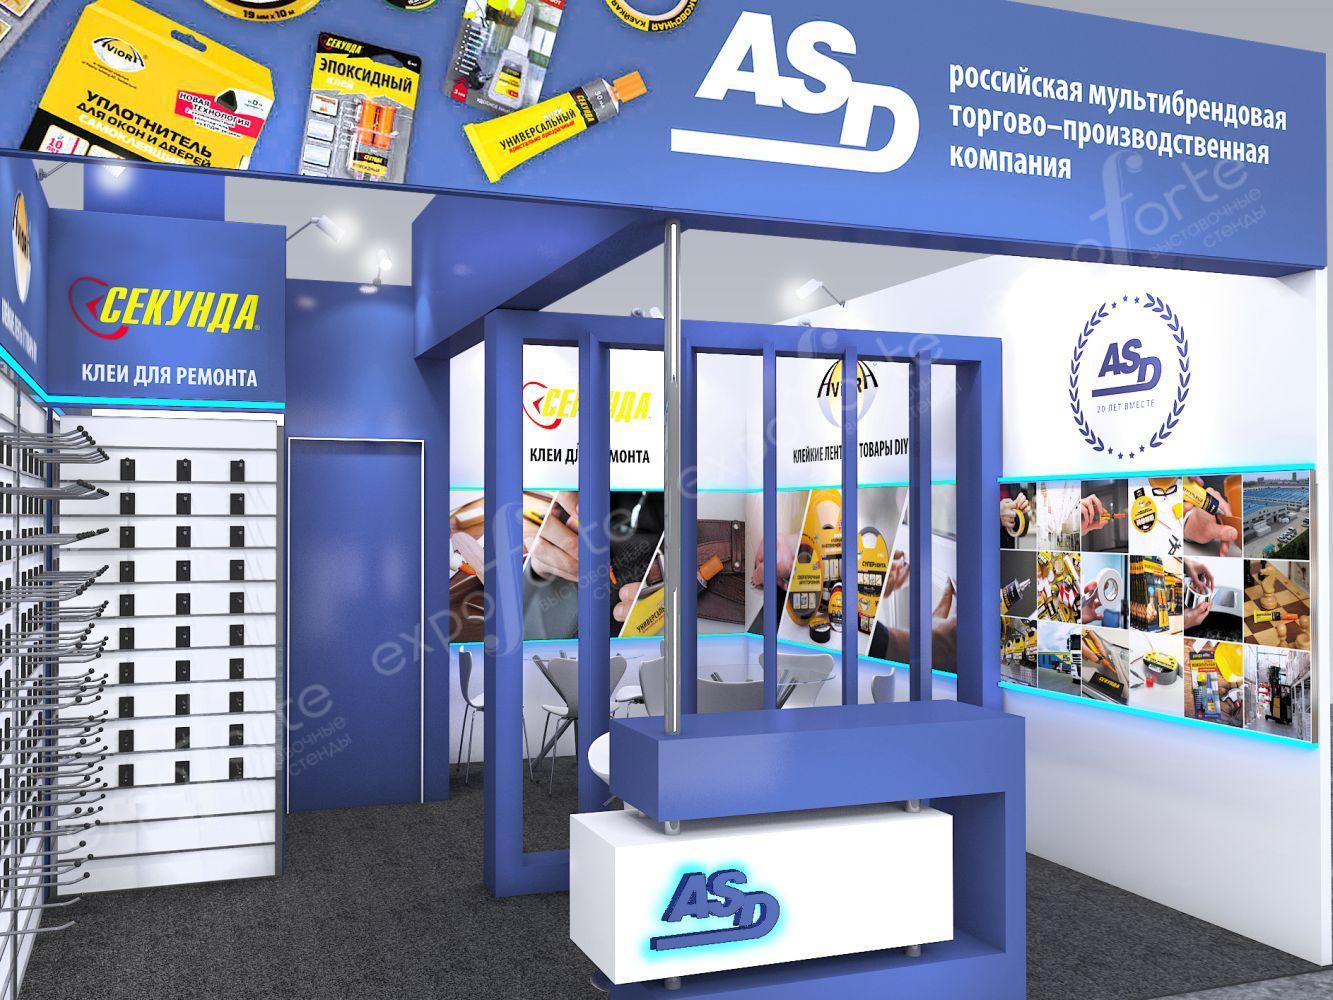 Фото: ASD, выставка МОСБИЛД – картинка 4